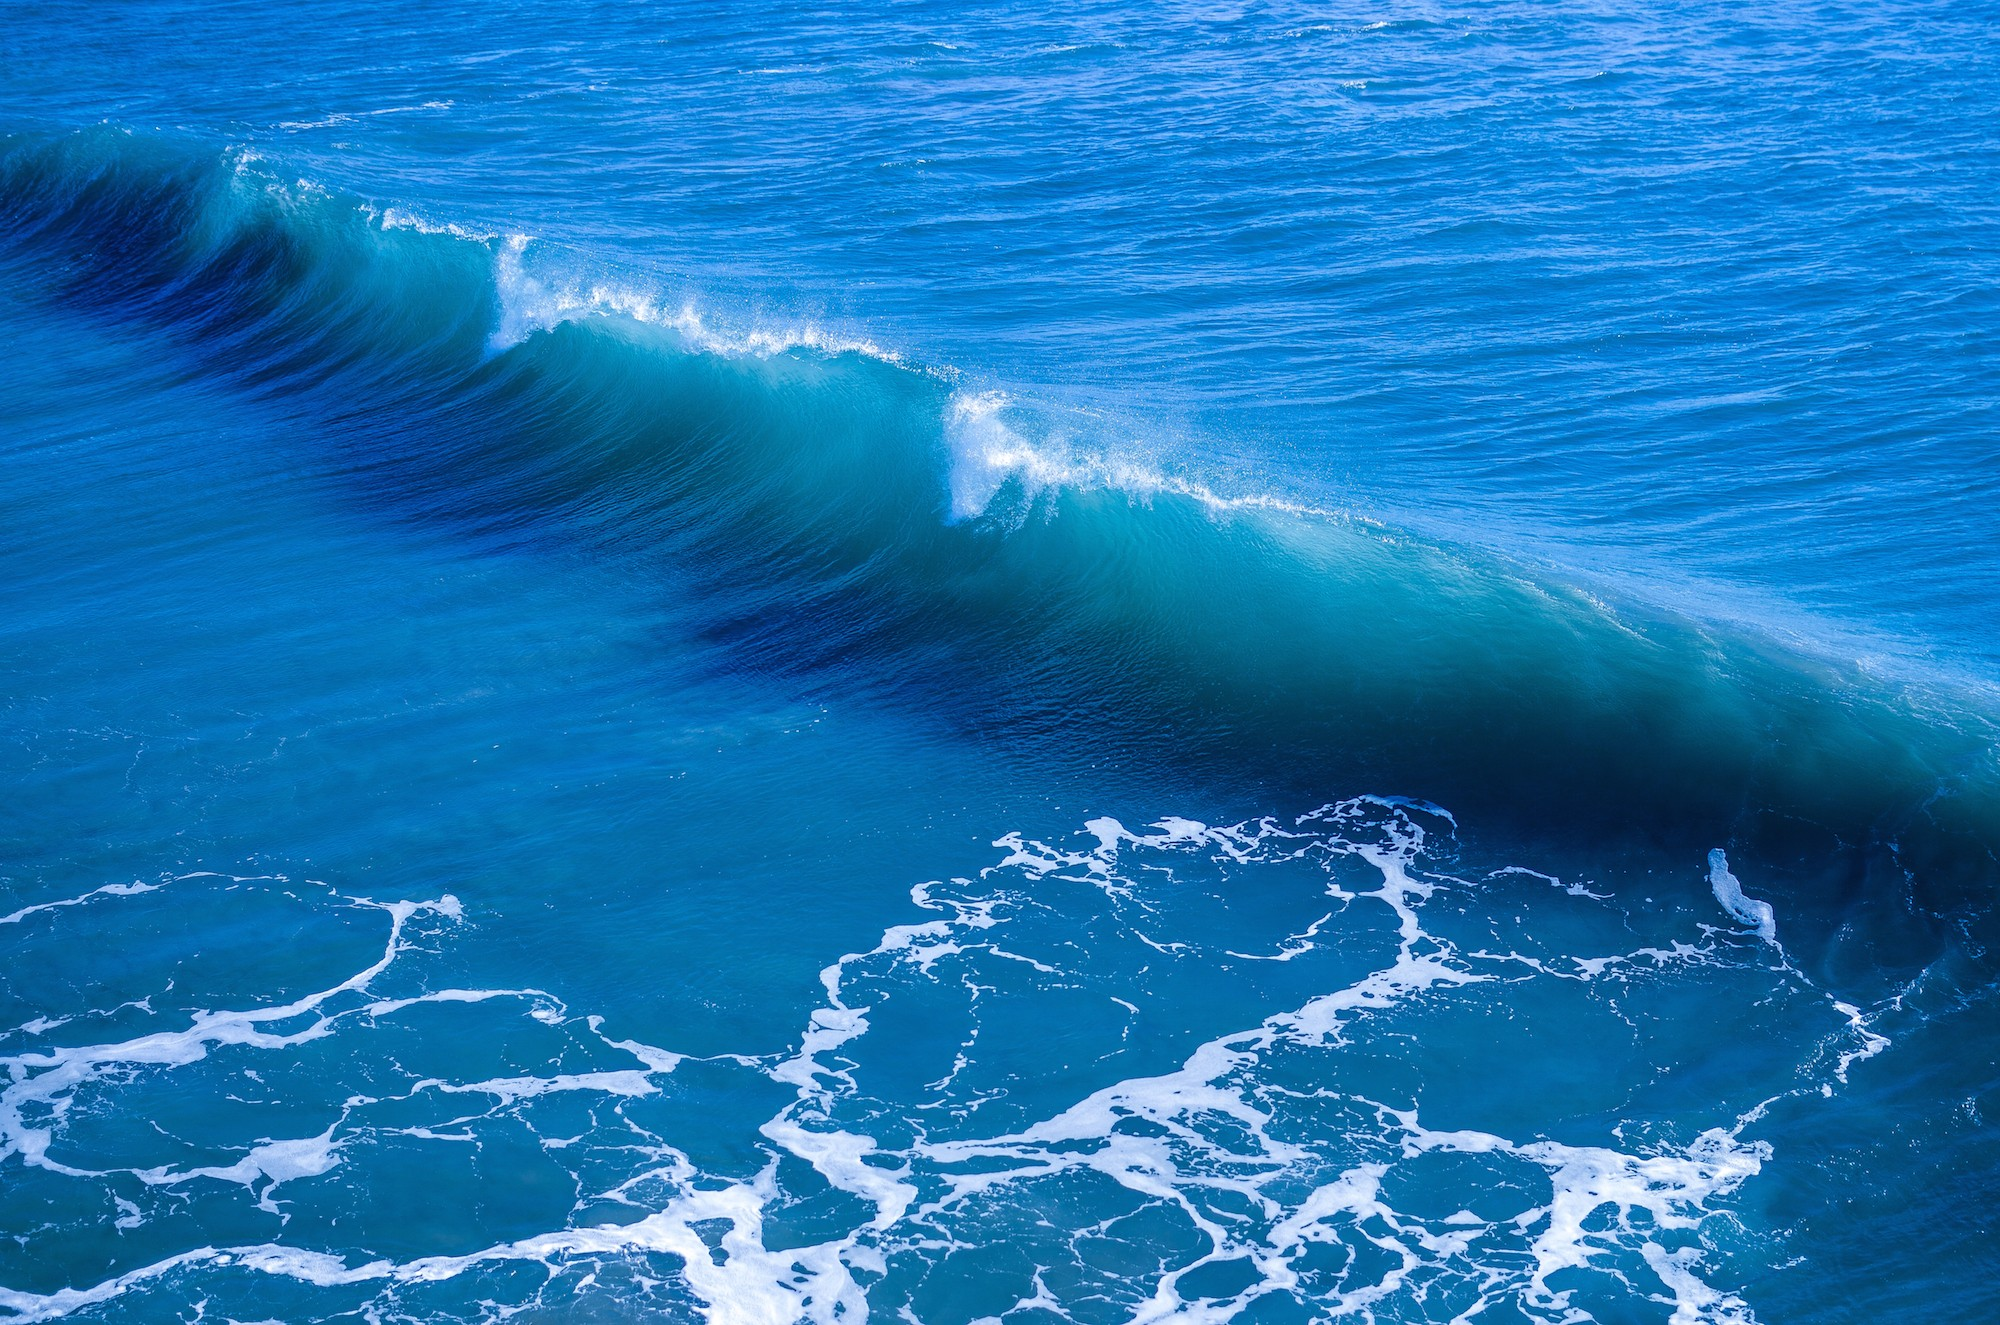 Single wave.jpg